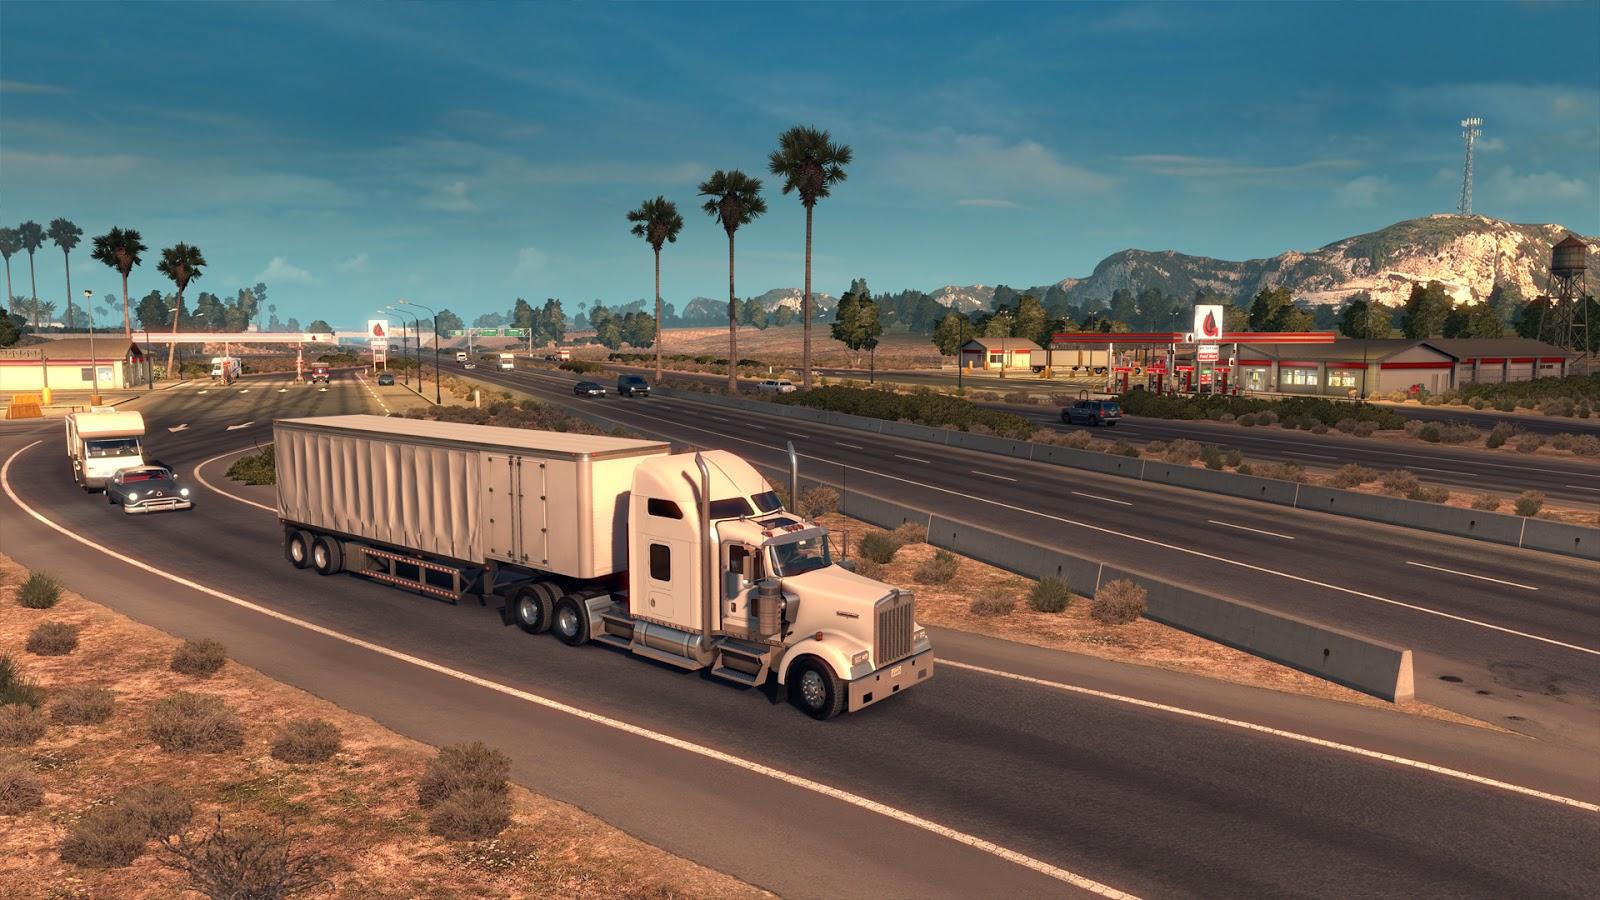 http://mihandownload.com/wp-content/uploads/American-Truck-Simulator-2016-4.jpg